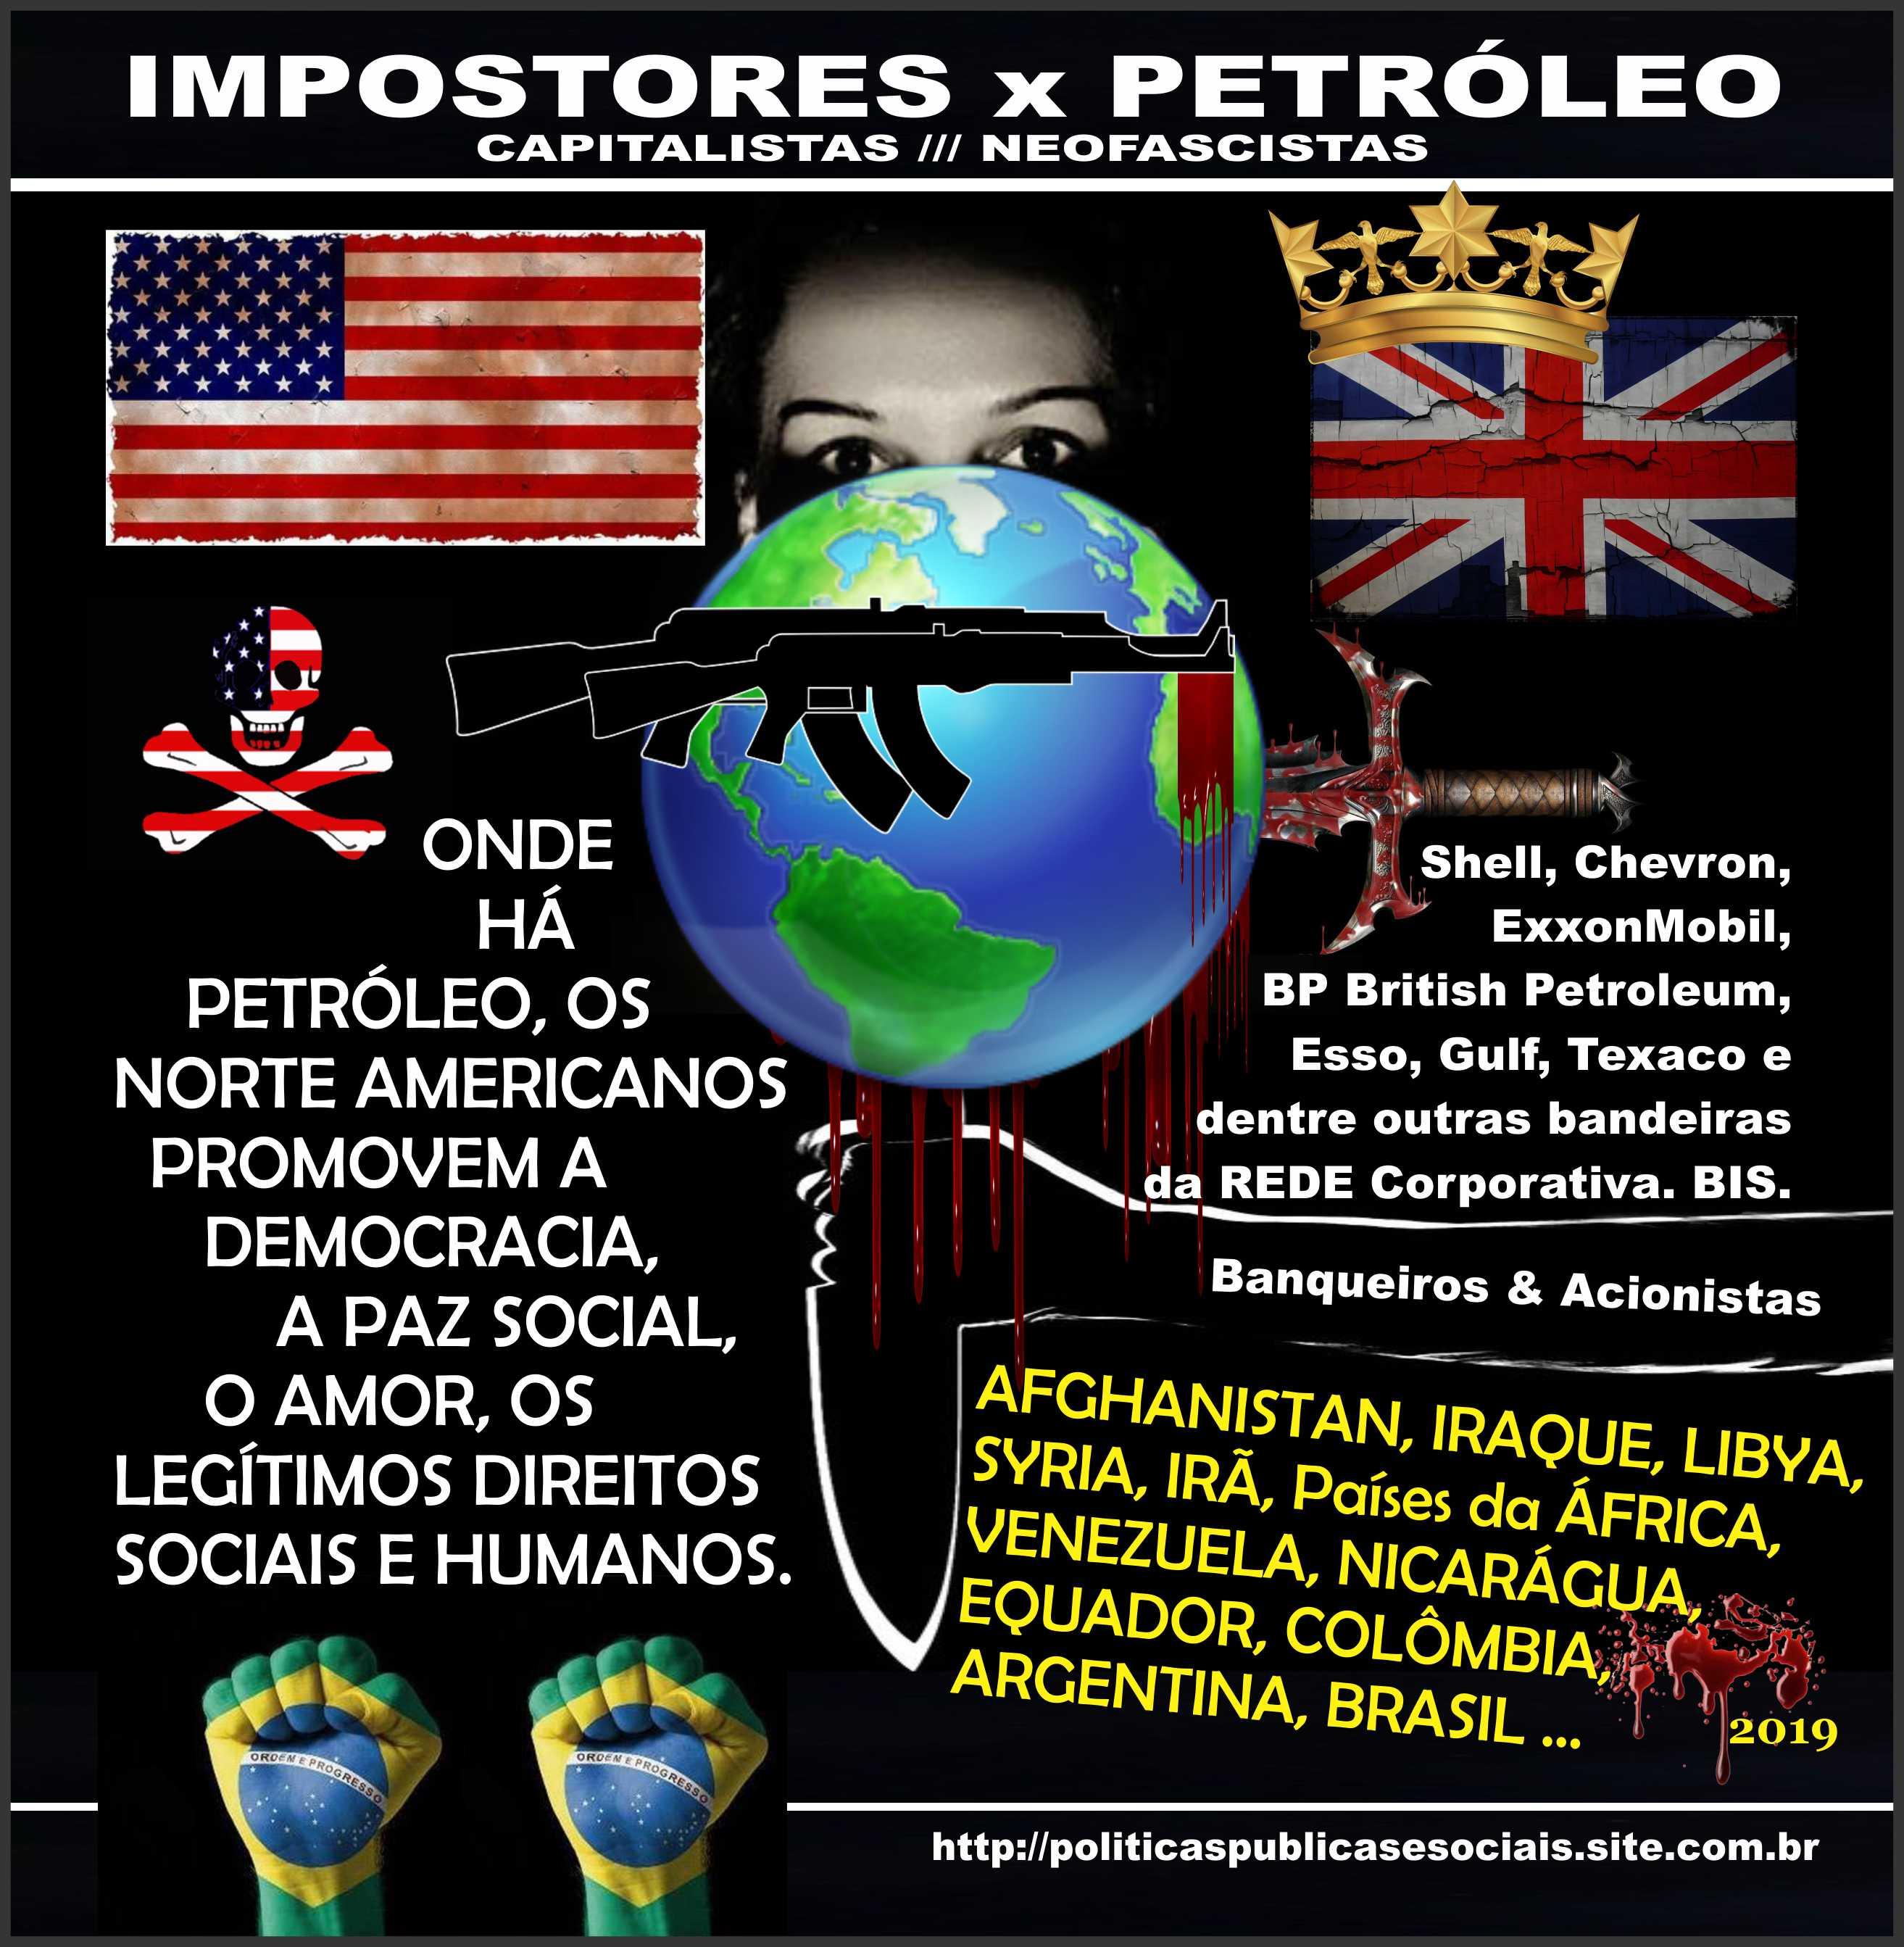 Impostores x Petróleo